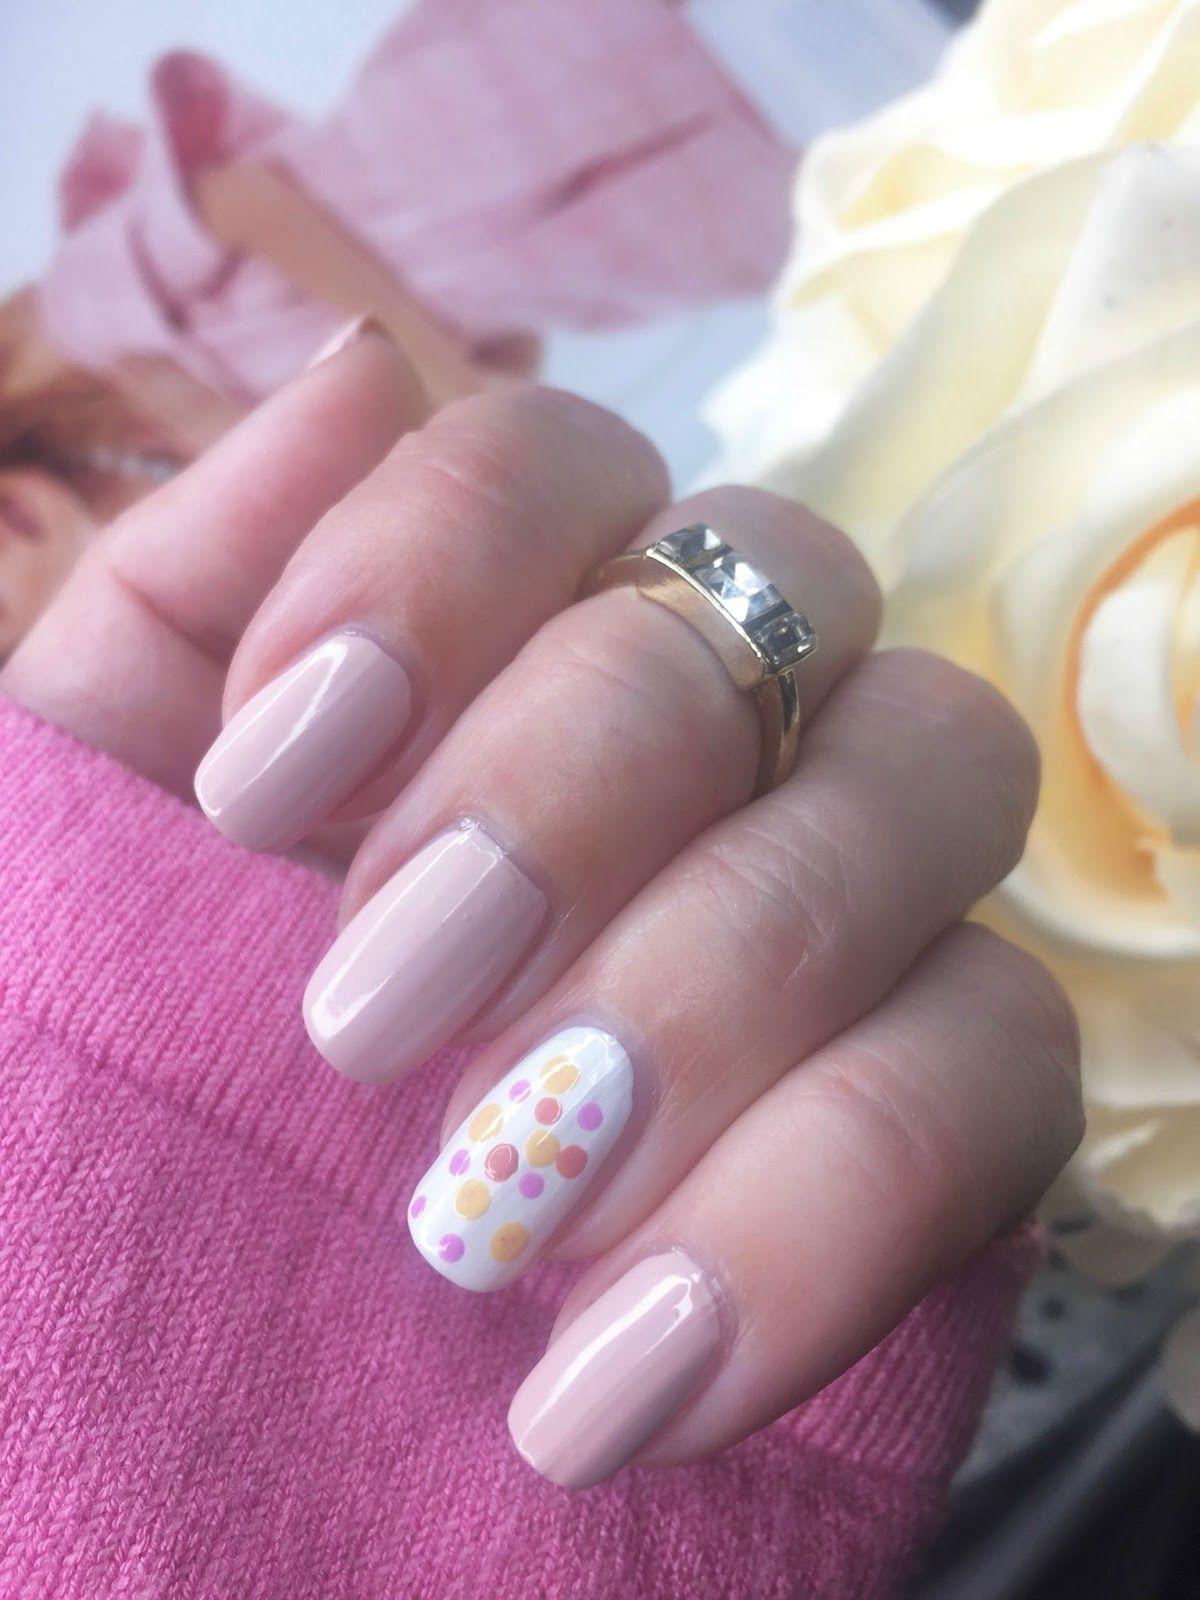 Best Spring Nail Colors 2018 By Lechat Spring Nail Colors Nail